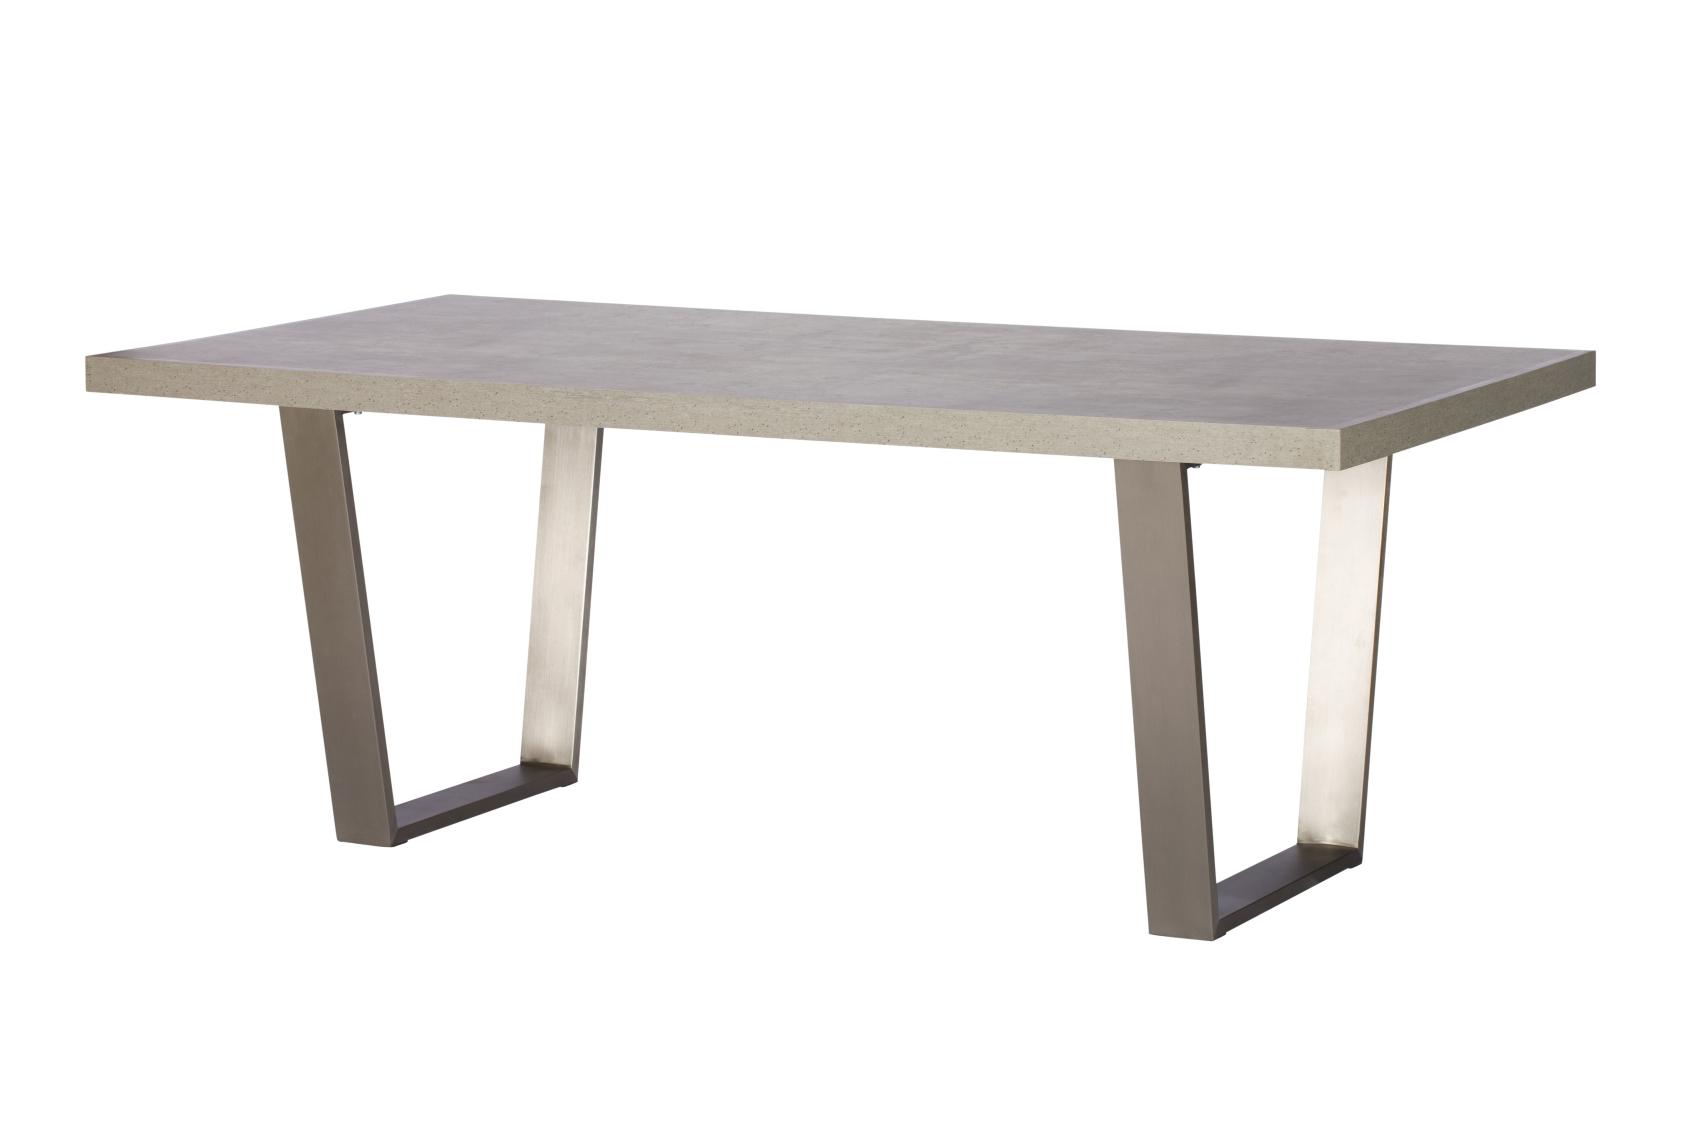 Pella Concrete Effect 160cm Dining Table